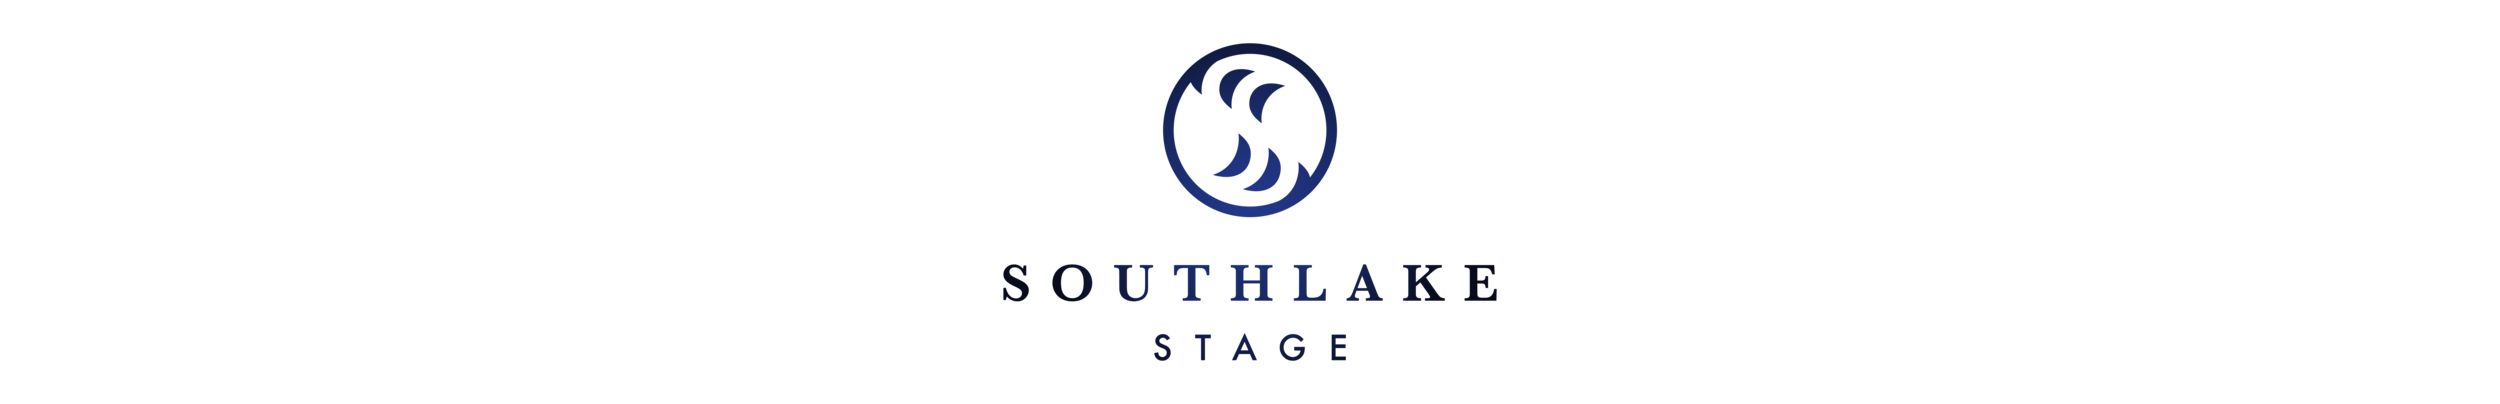 Southlake-01.png